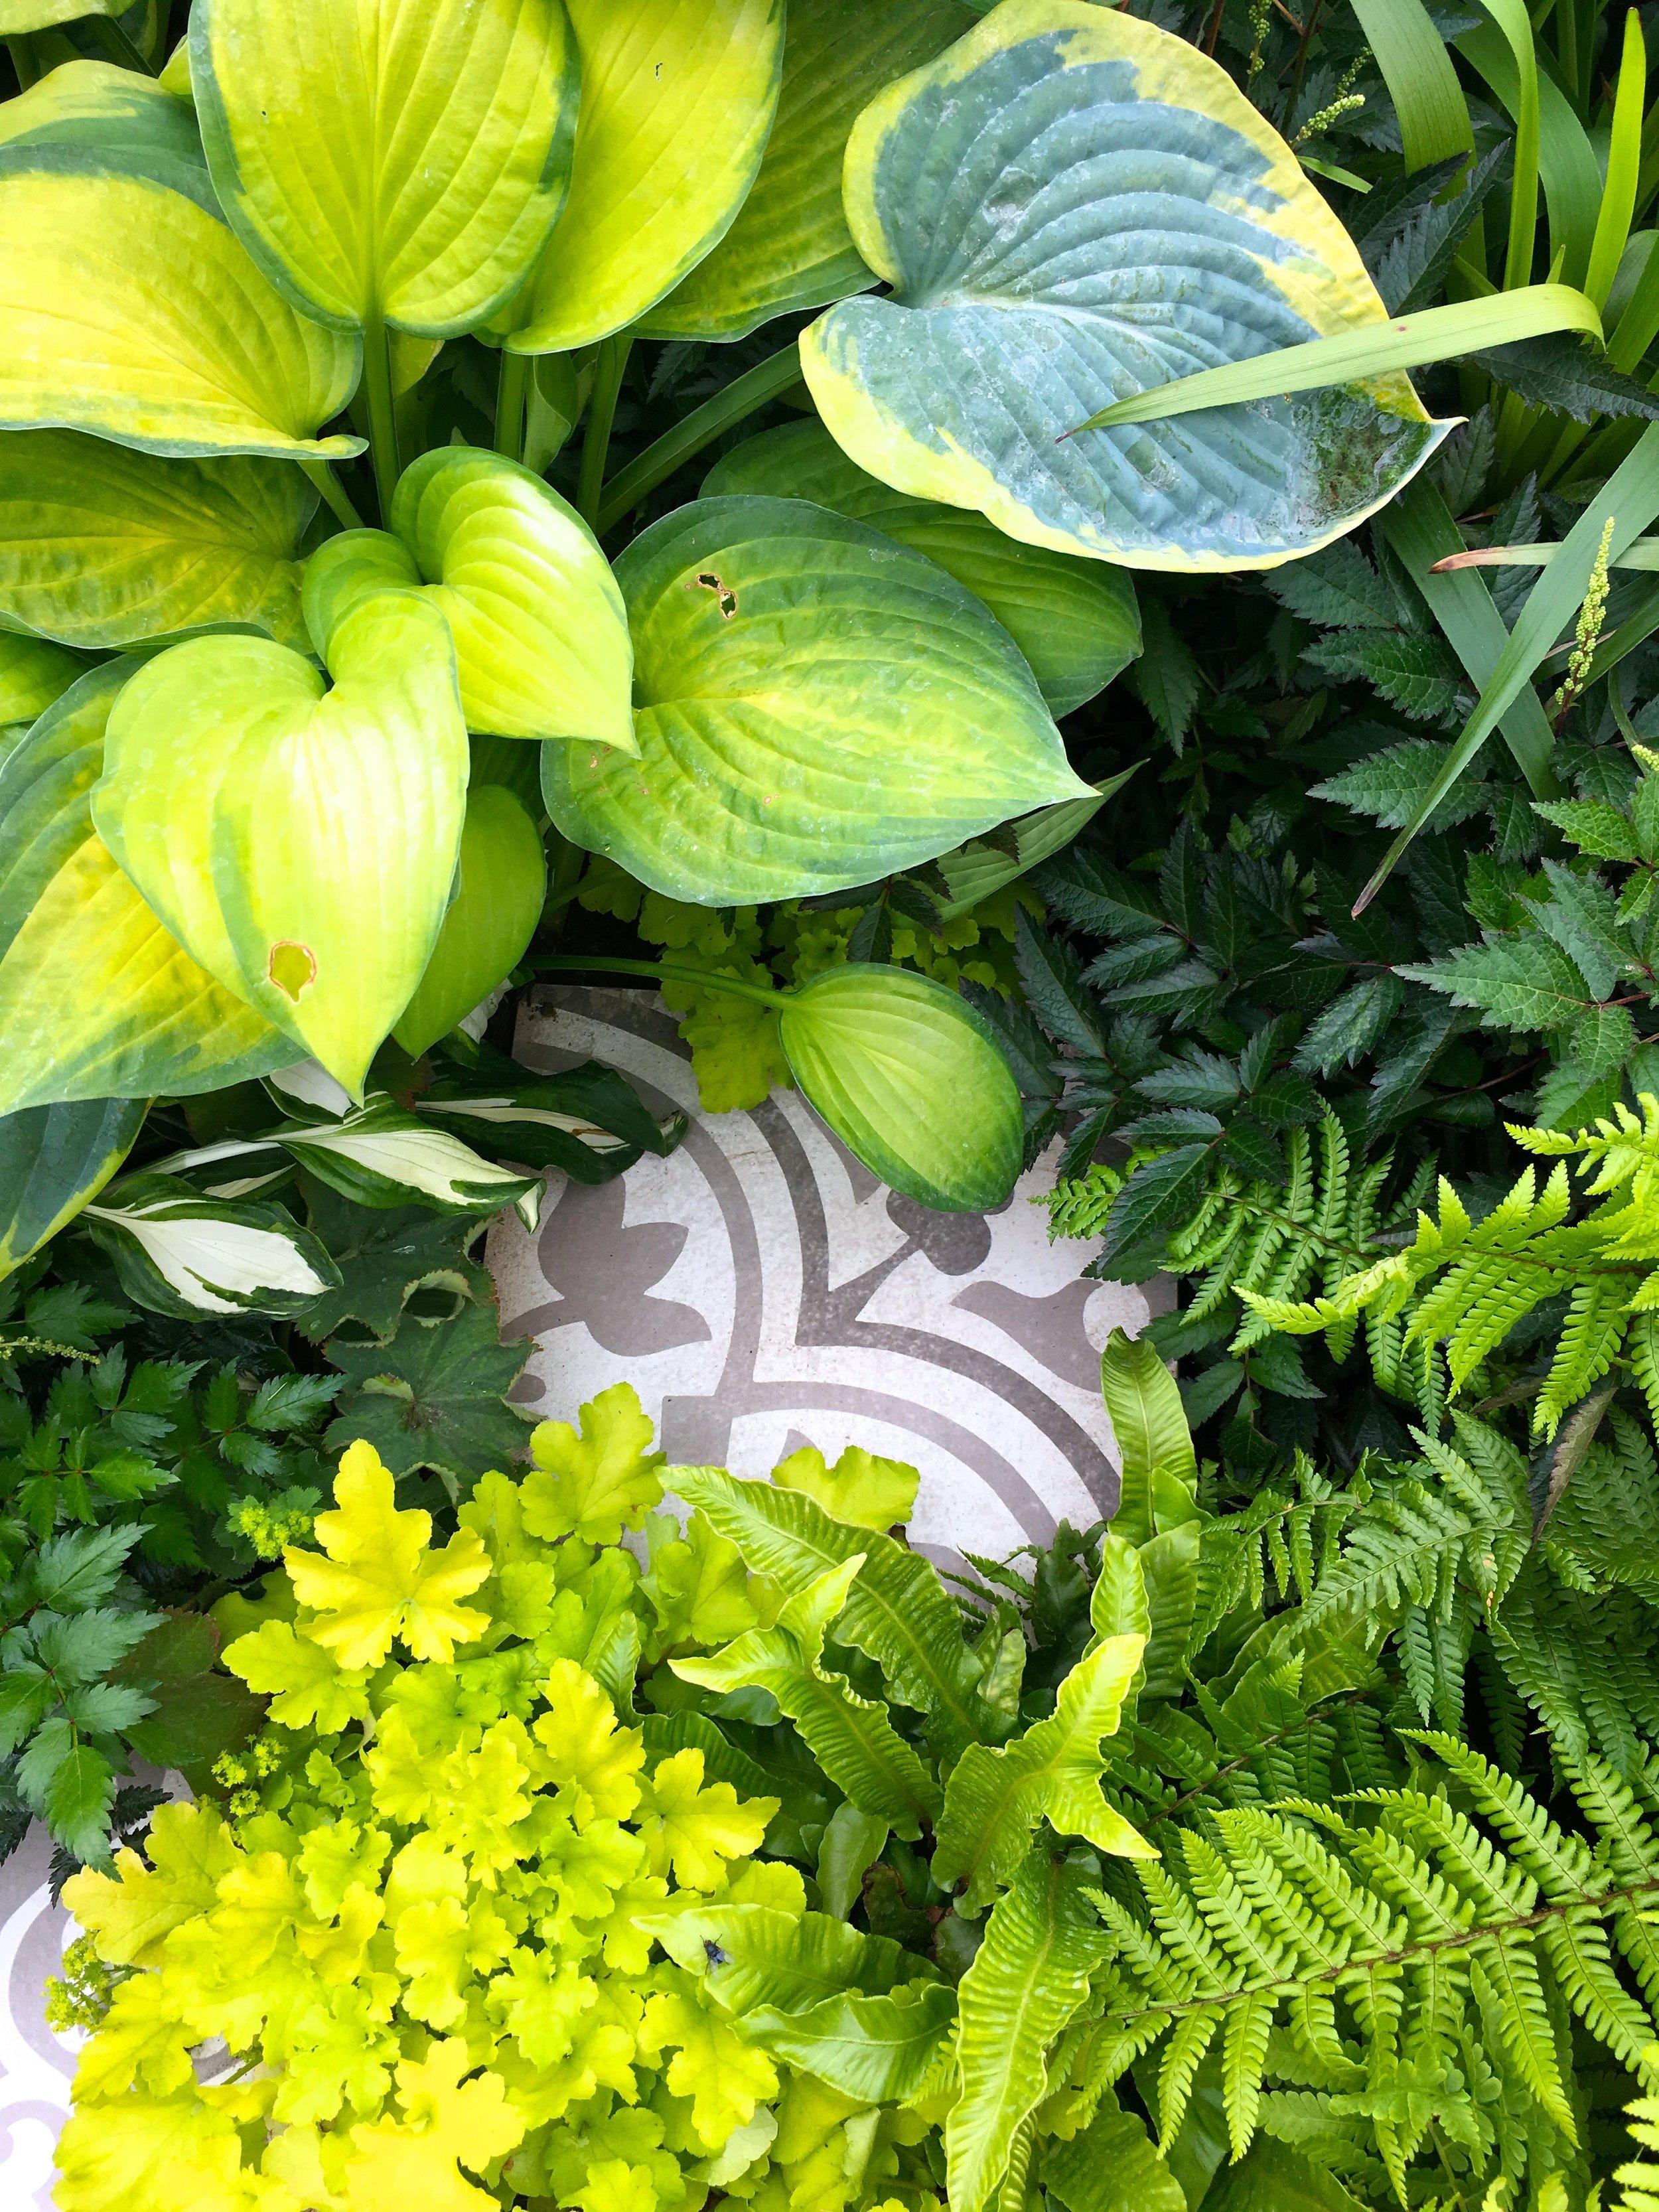 spot the tile amongst the greenery